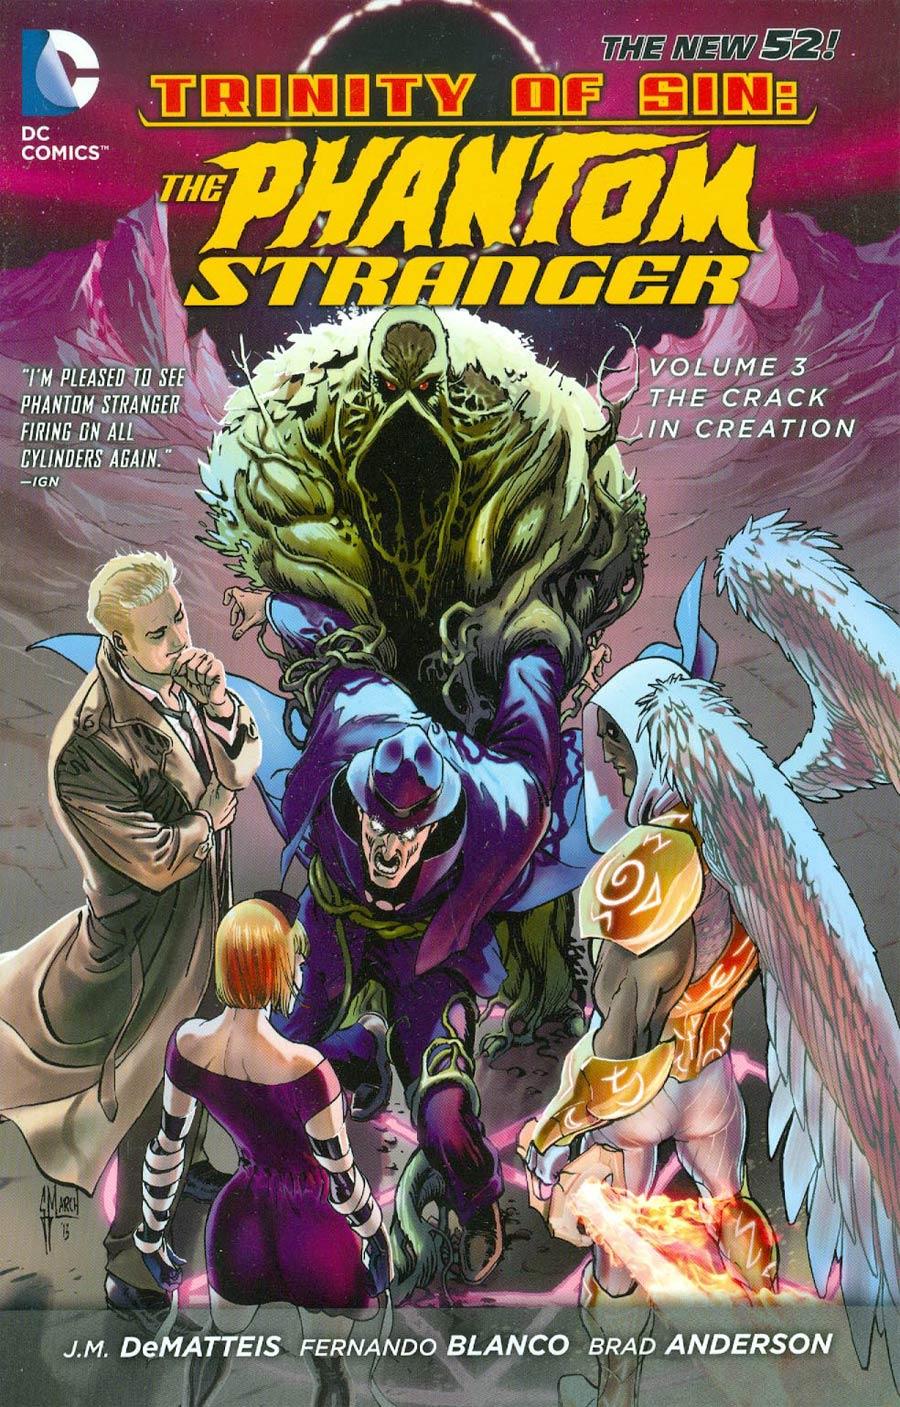 Trinity Of Sin Phantom Stranger (New 52) Vol 3 Crack In Creation TP